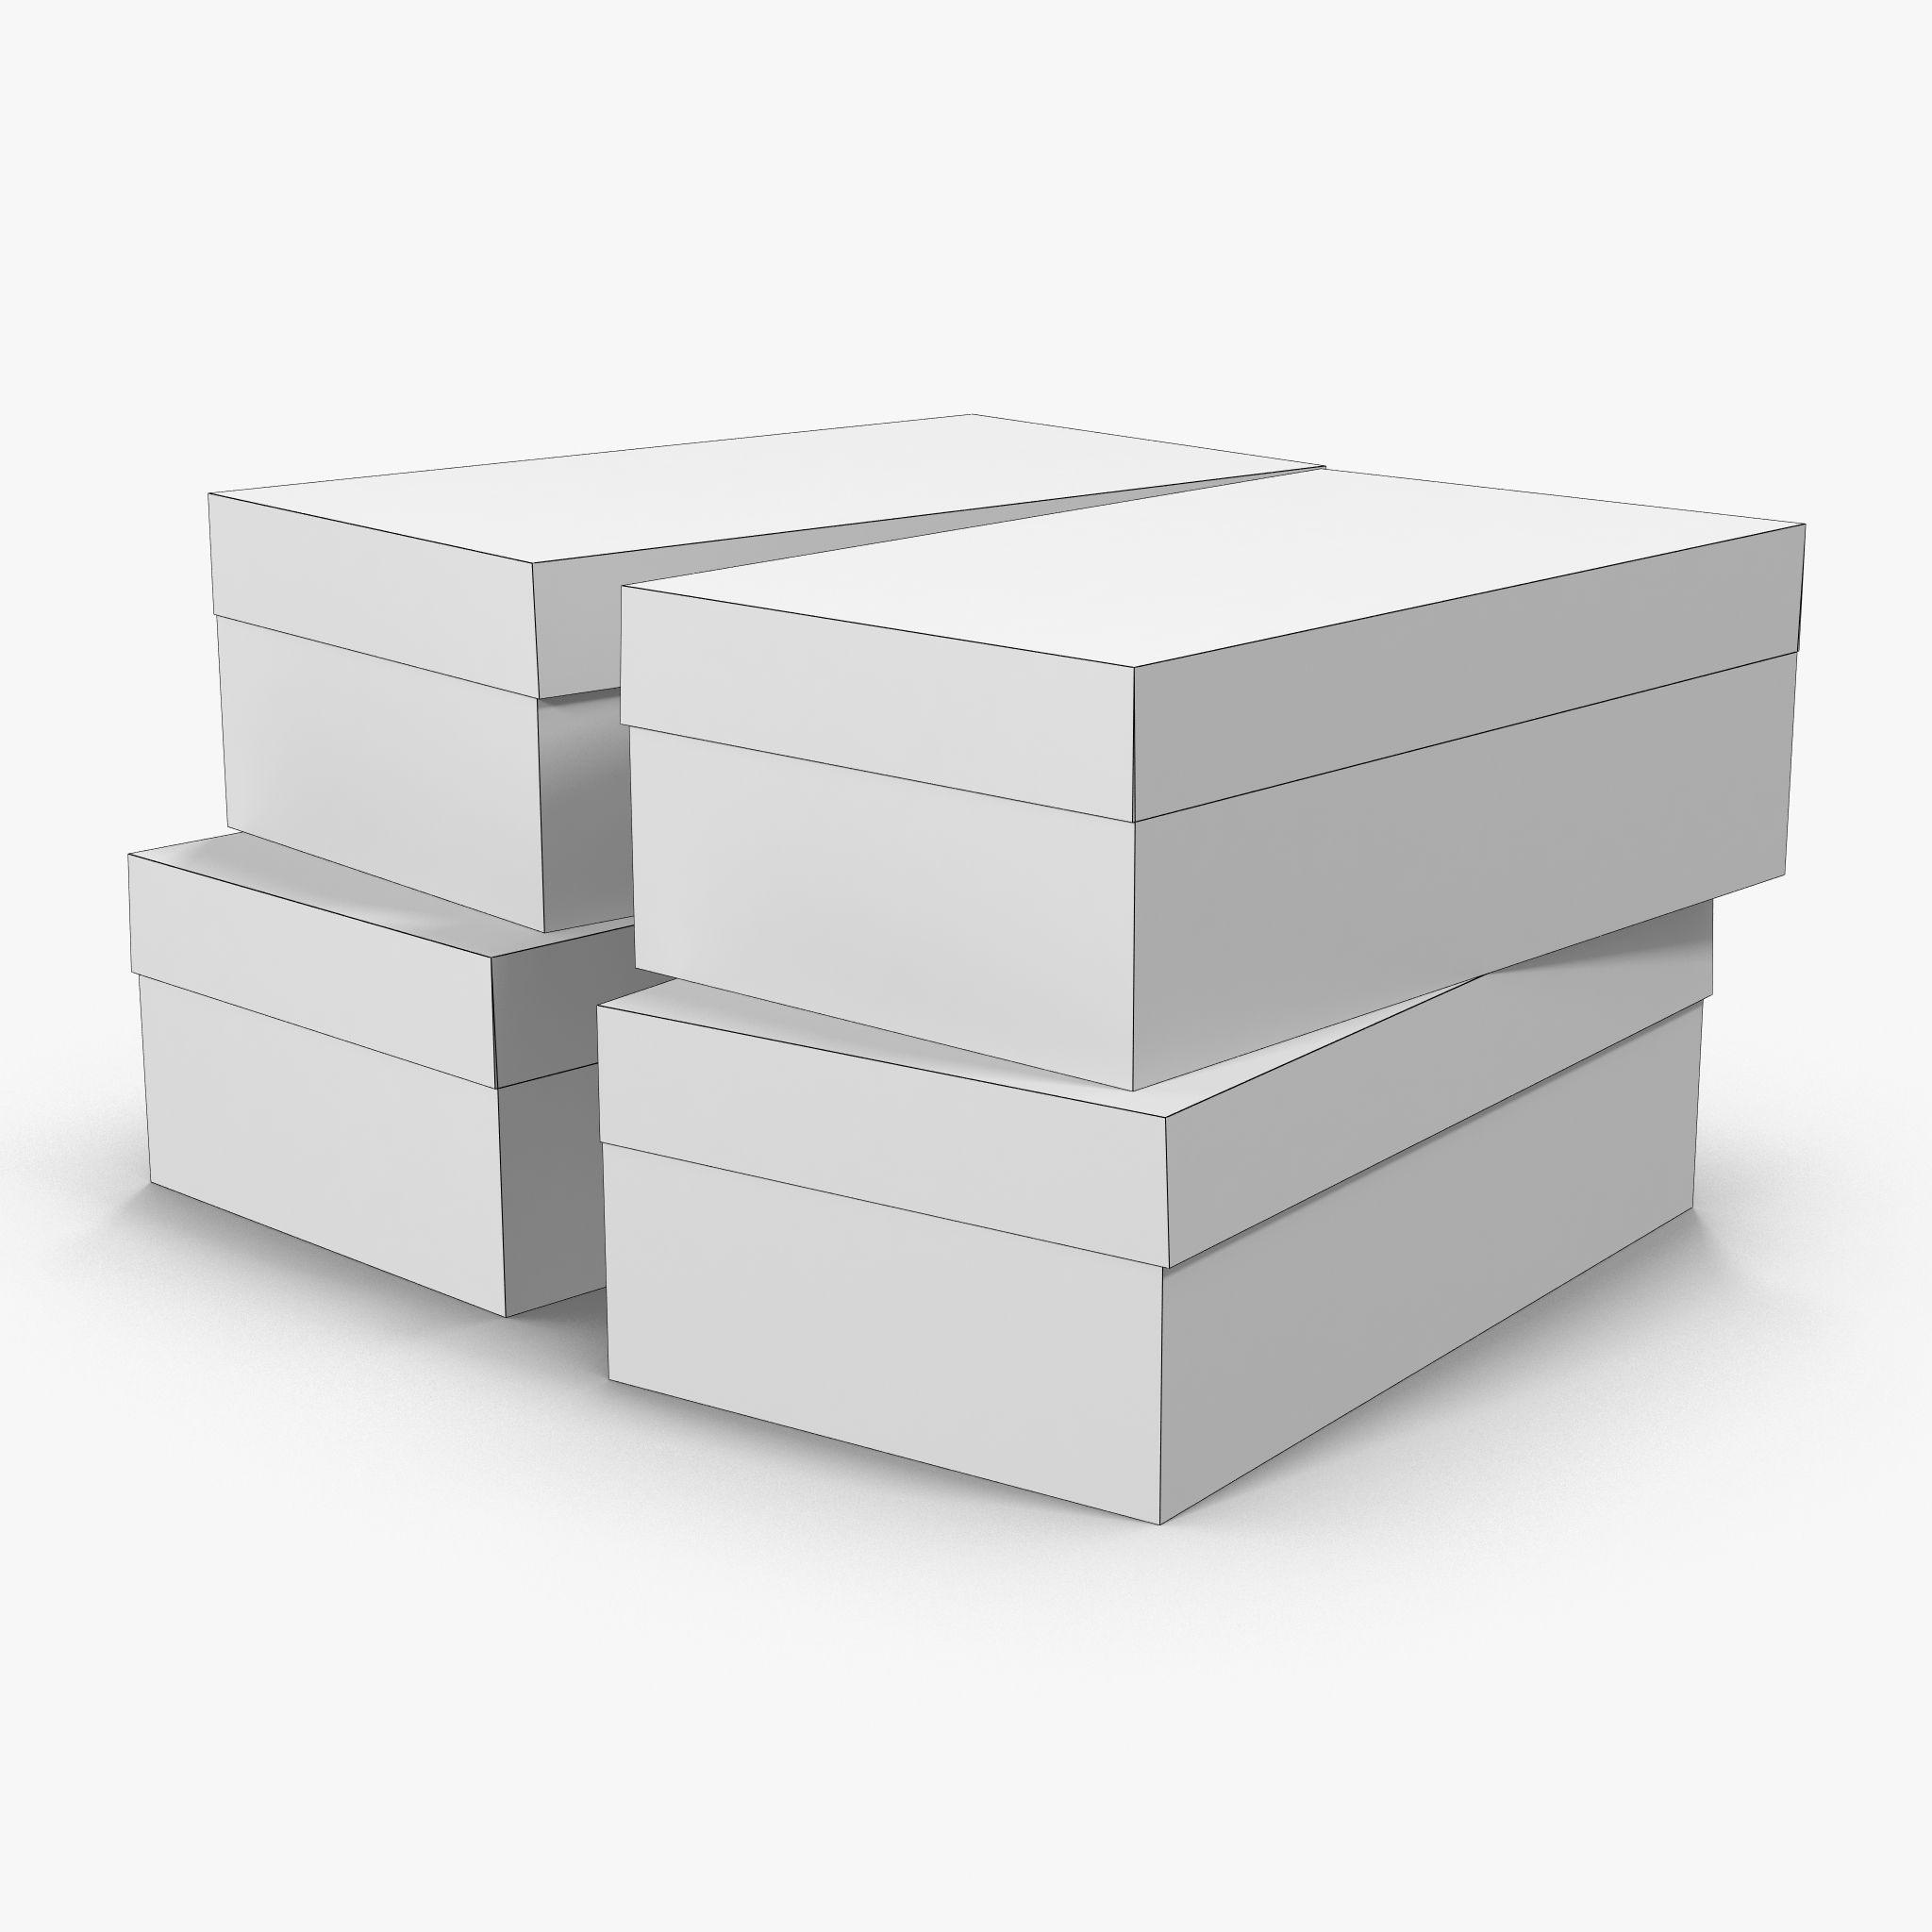 Colored Shoe Boxes Low Poly Shoe Box Colorful Shoes Business Attire For Men